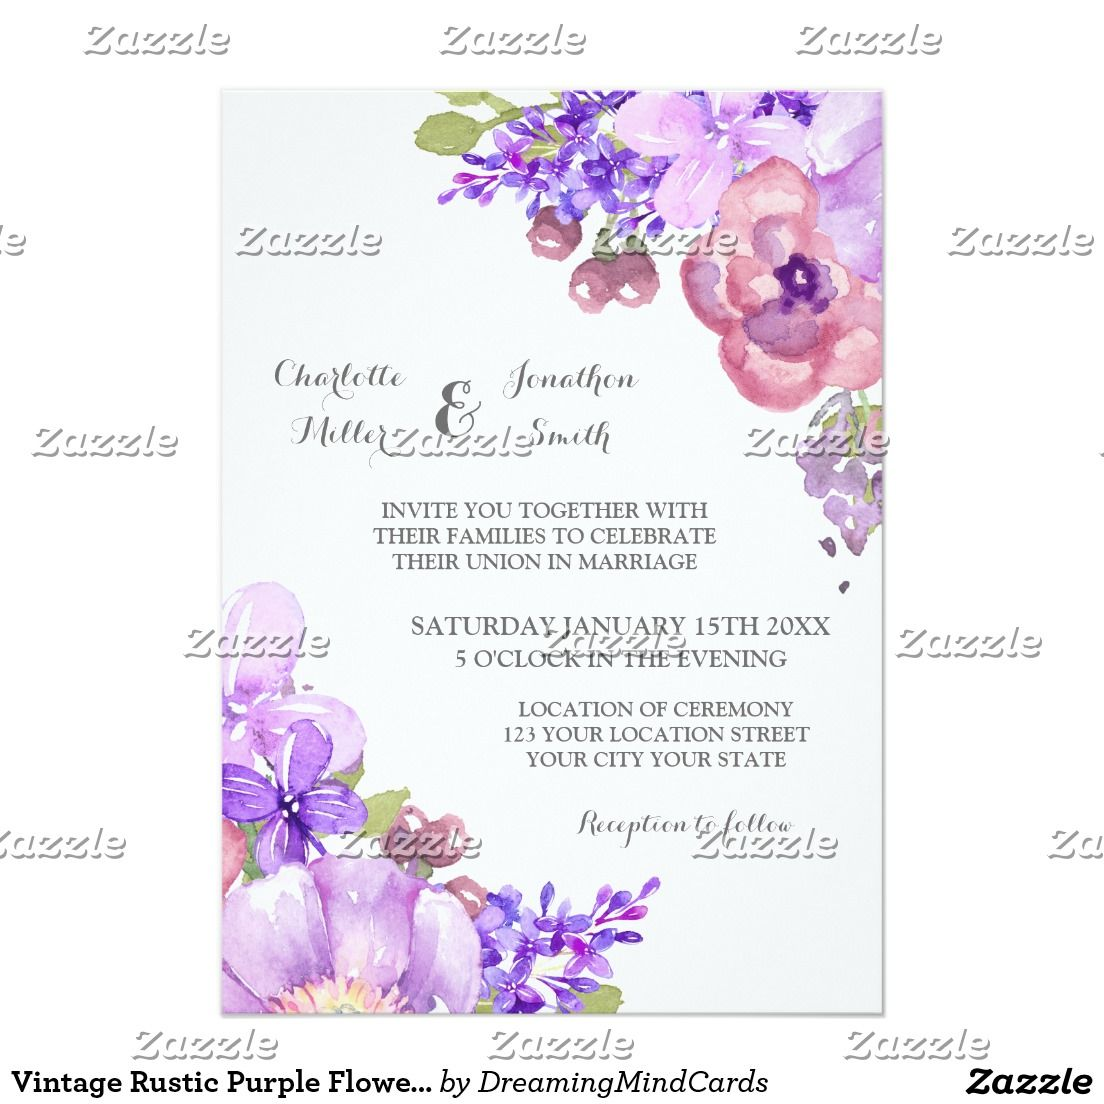 Vintage Rustic Purple Flowers Wedding Invitations | Country wedding ...